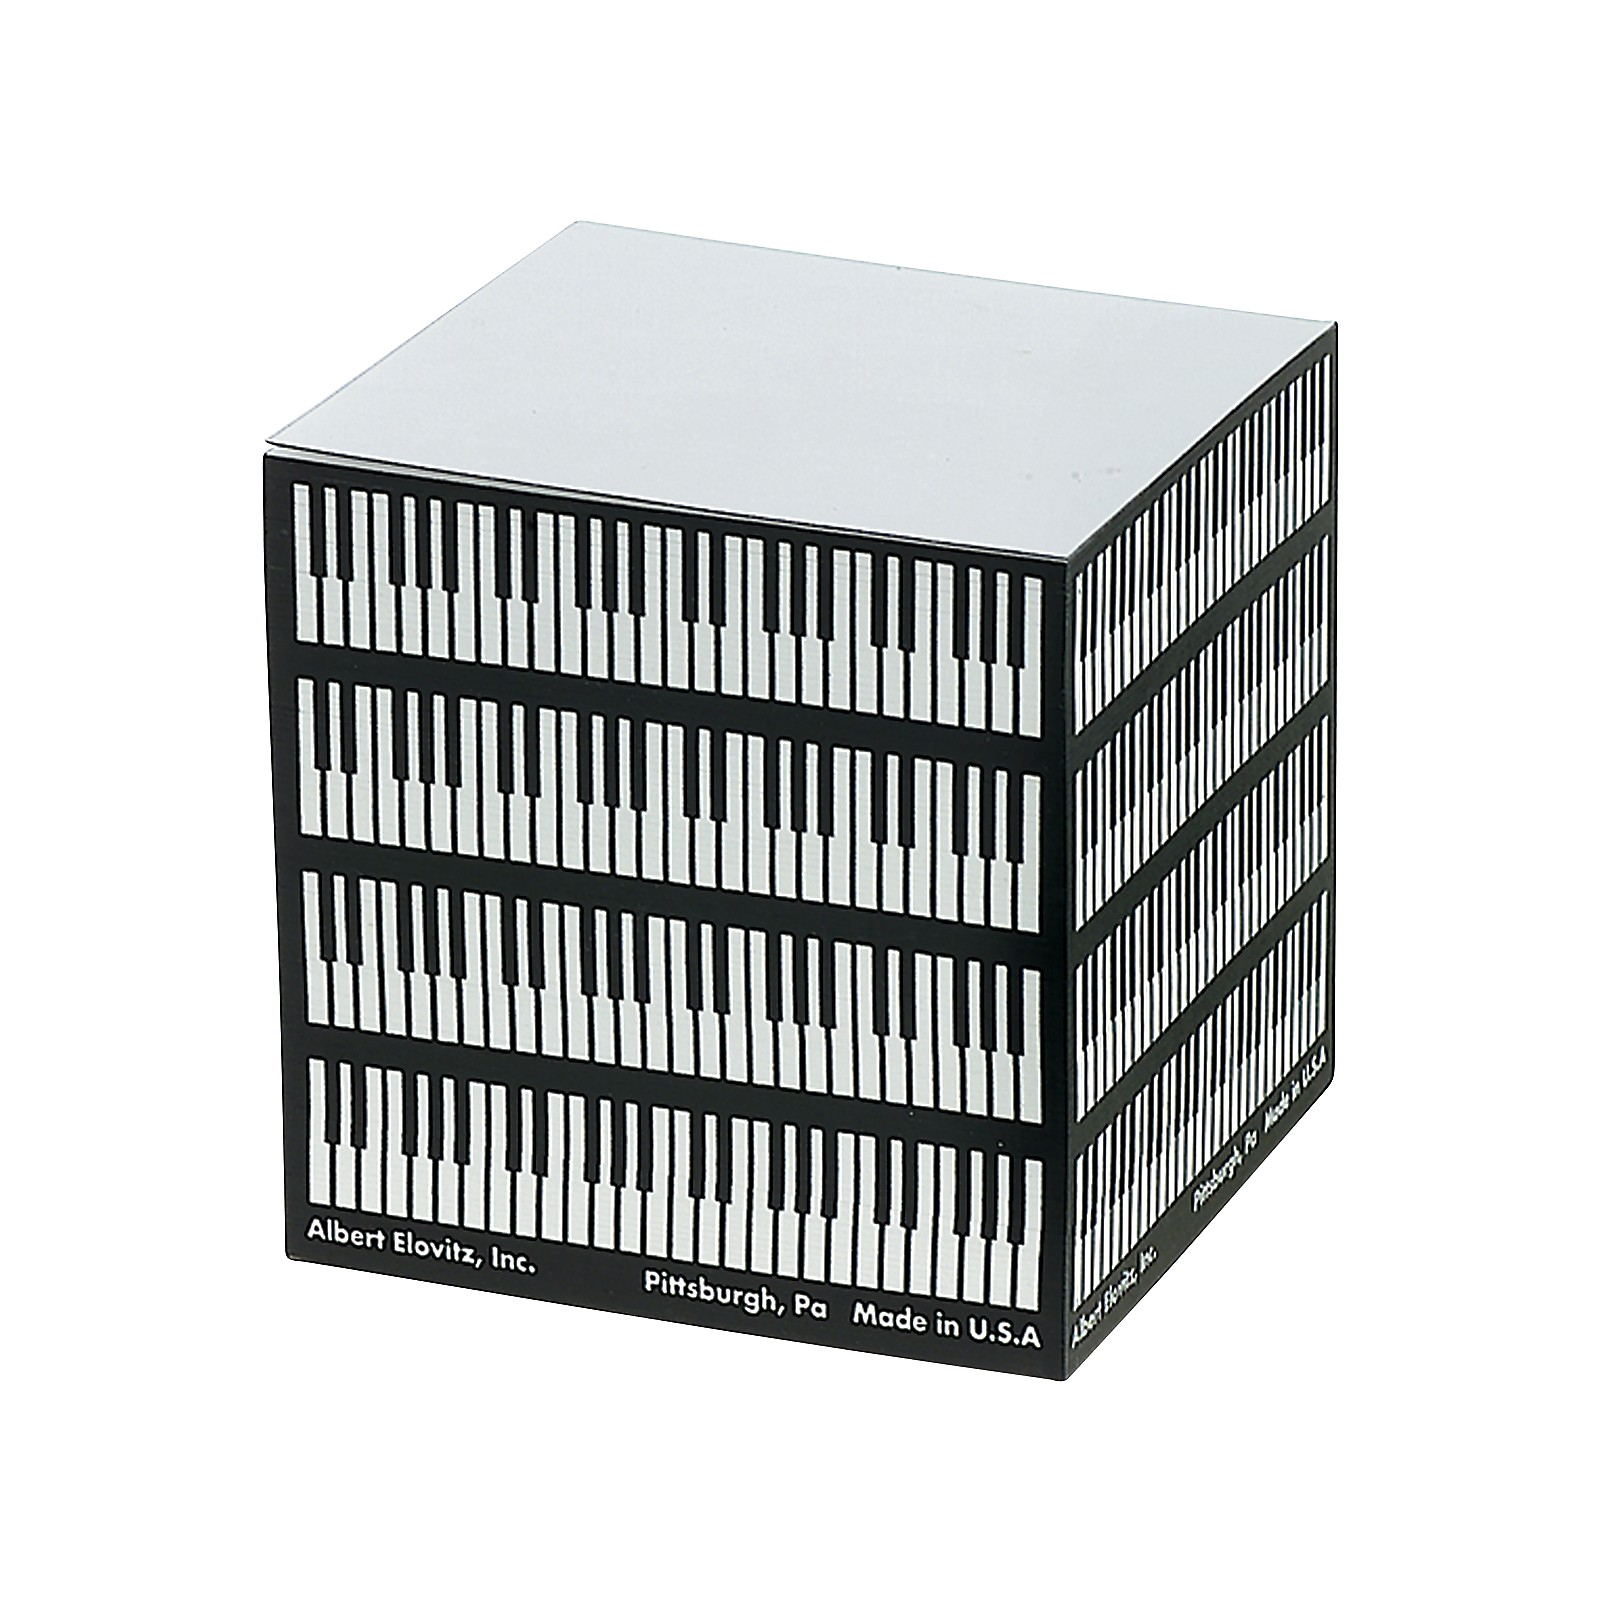 AIM Memo Cube with Keyboard Design